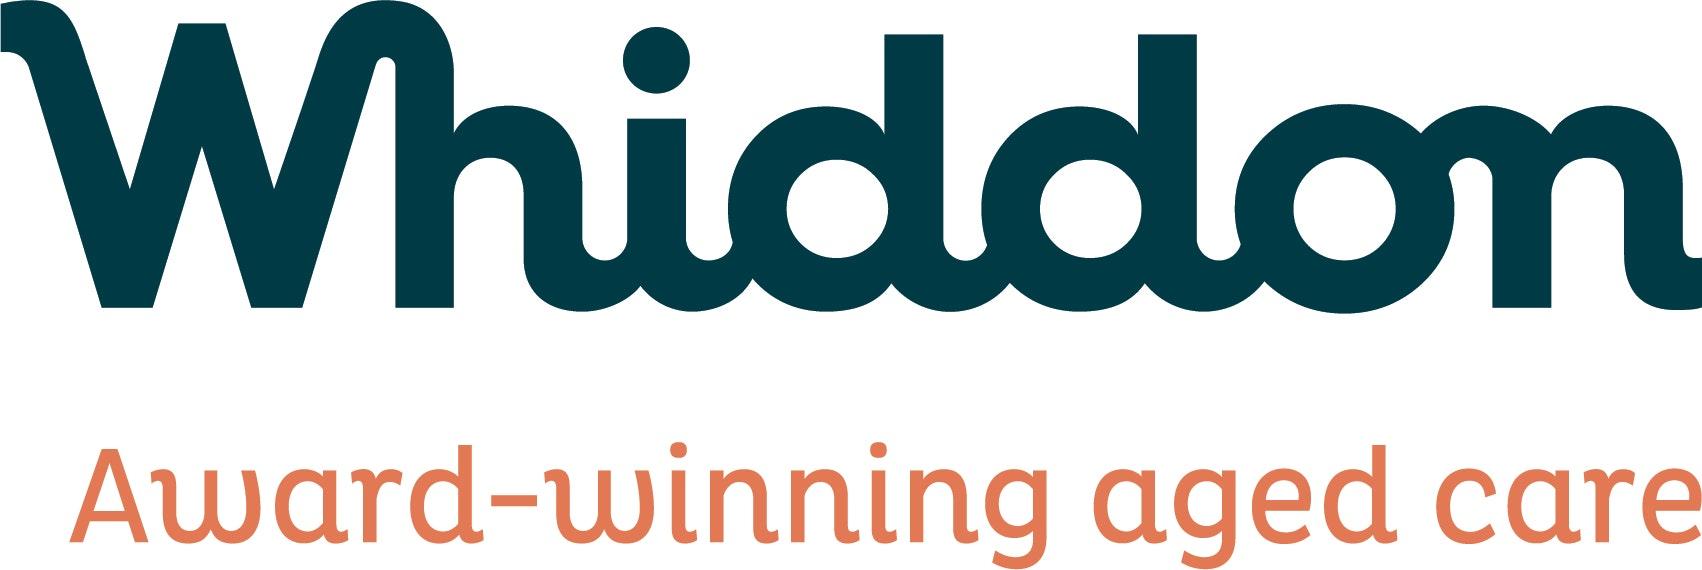 Whiddon Maclean logo